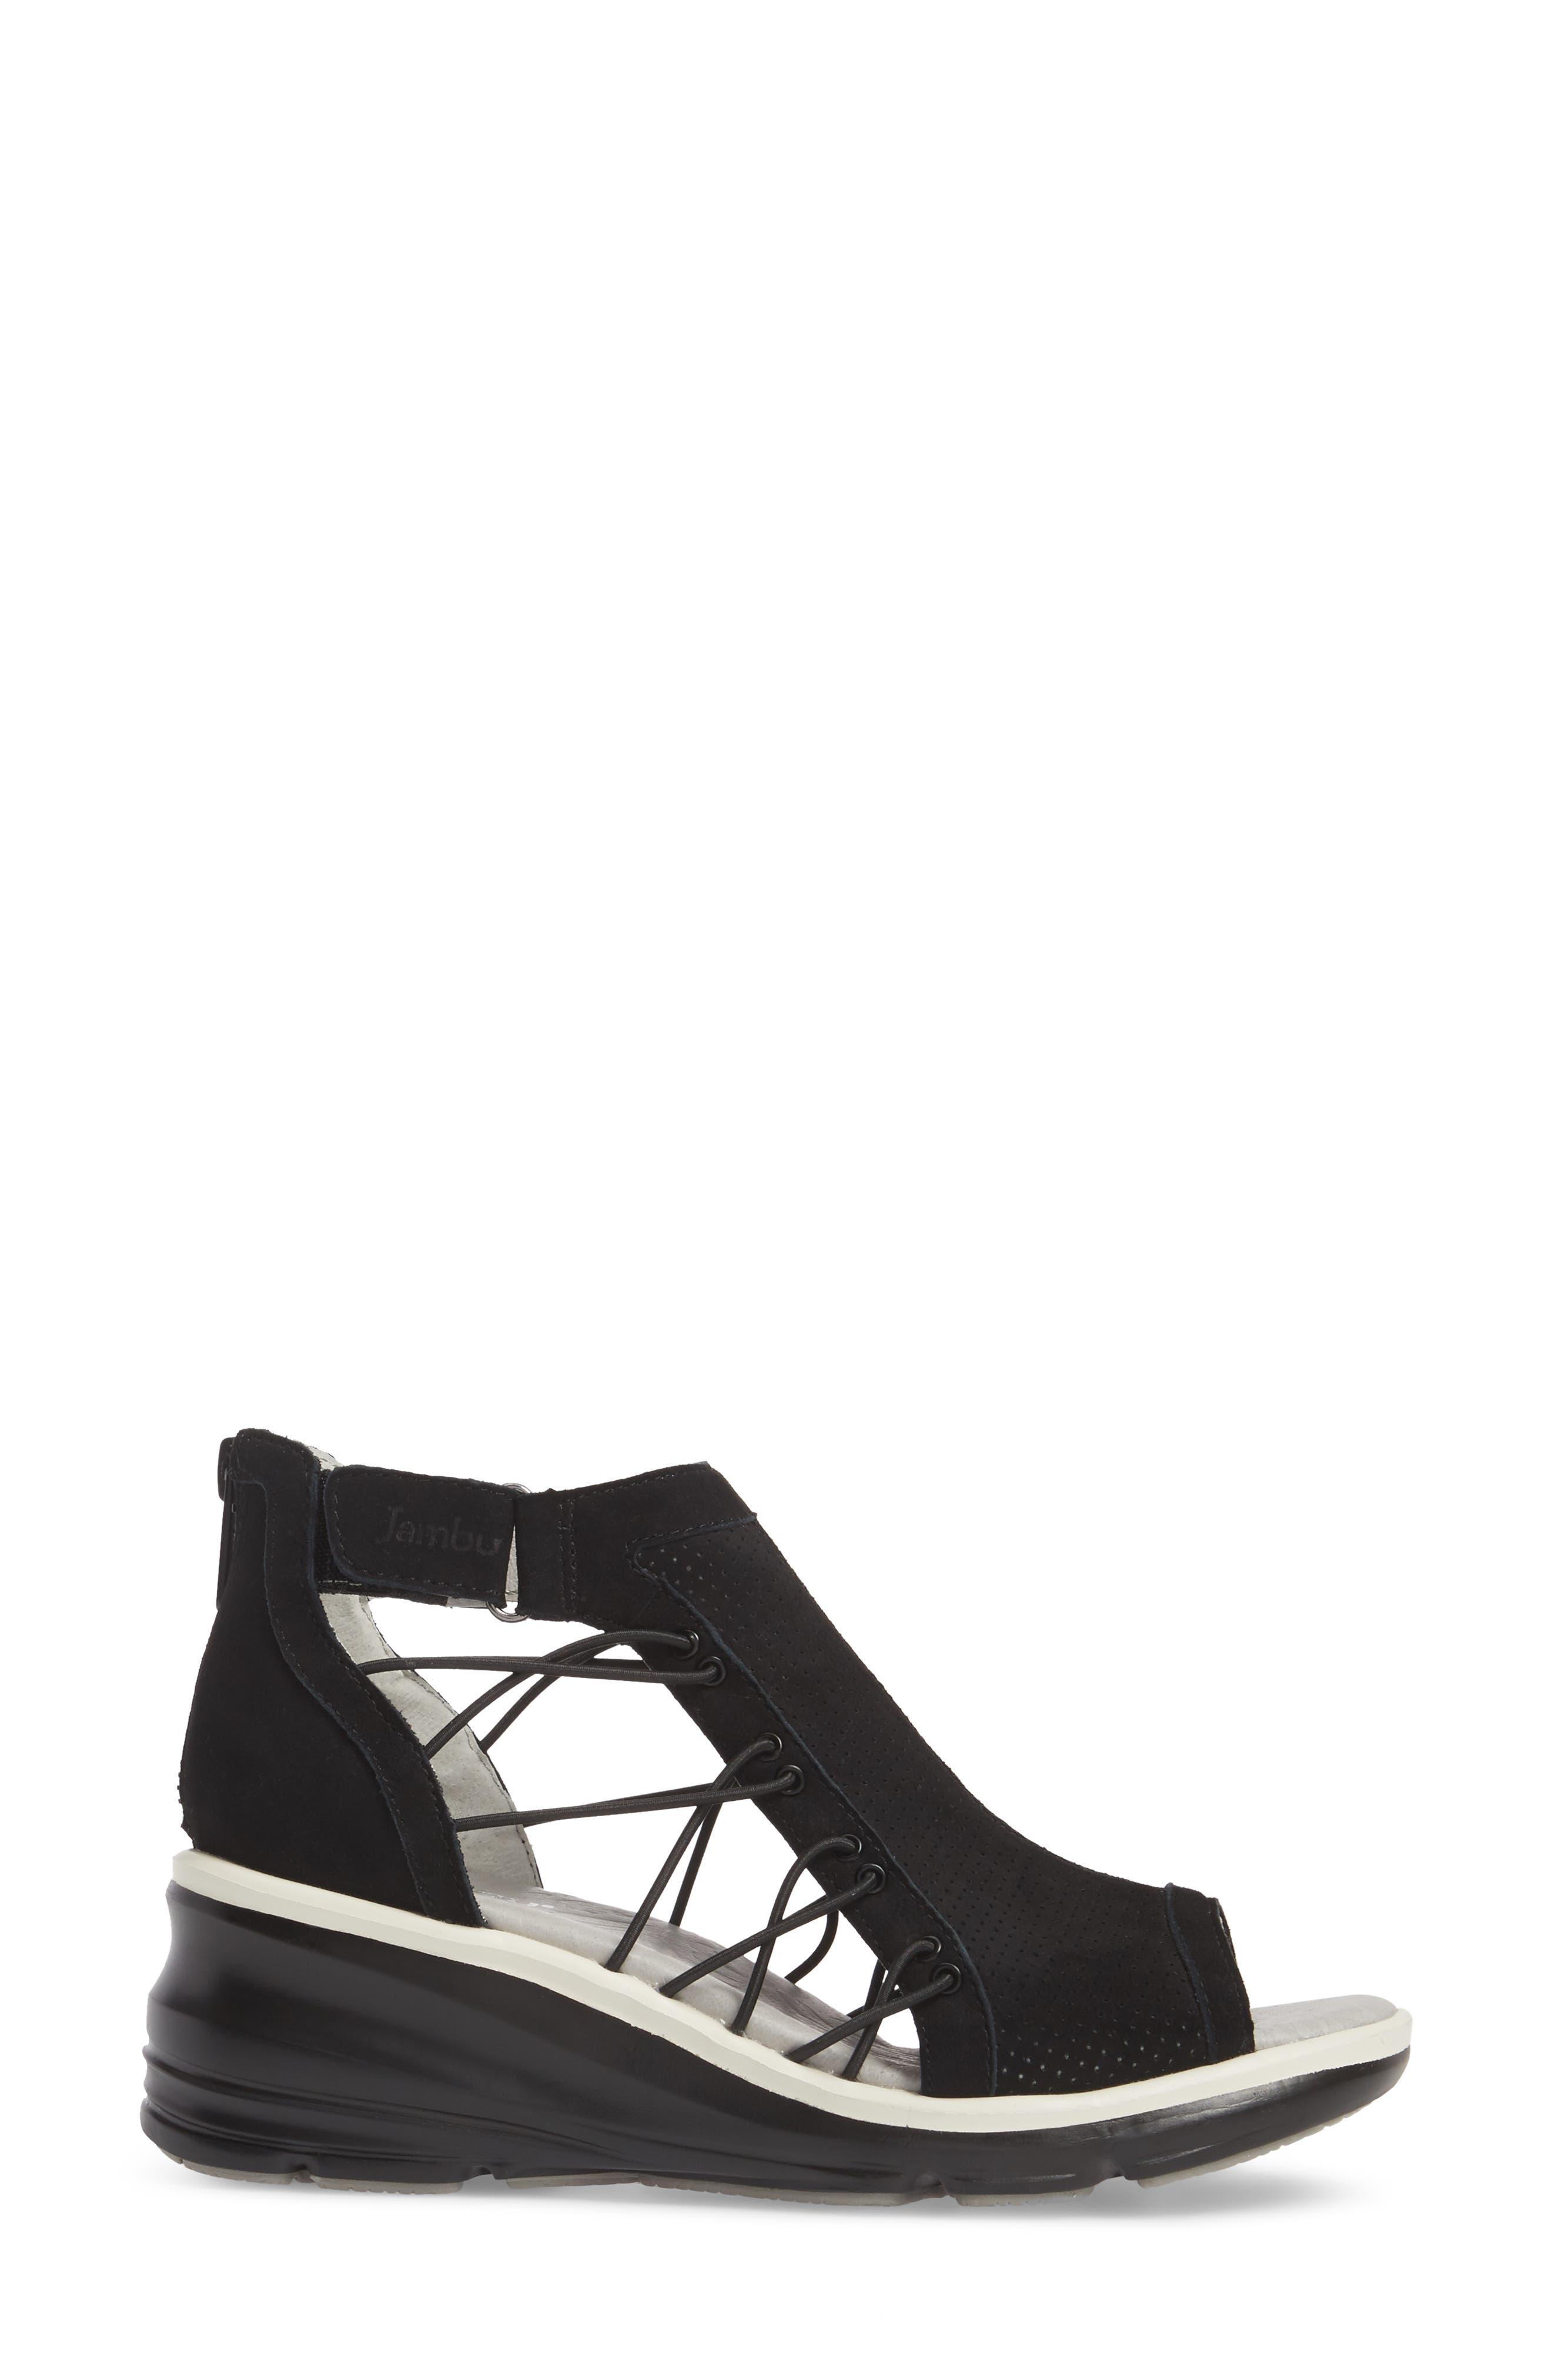 JAMBU, Naomi Perforated Wedge Sandal, Alternate thumbnail 3, color, BLACK SUEDE